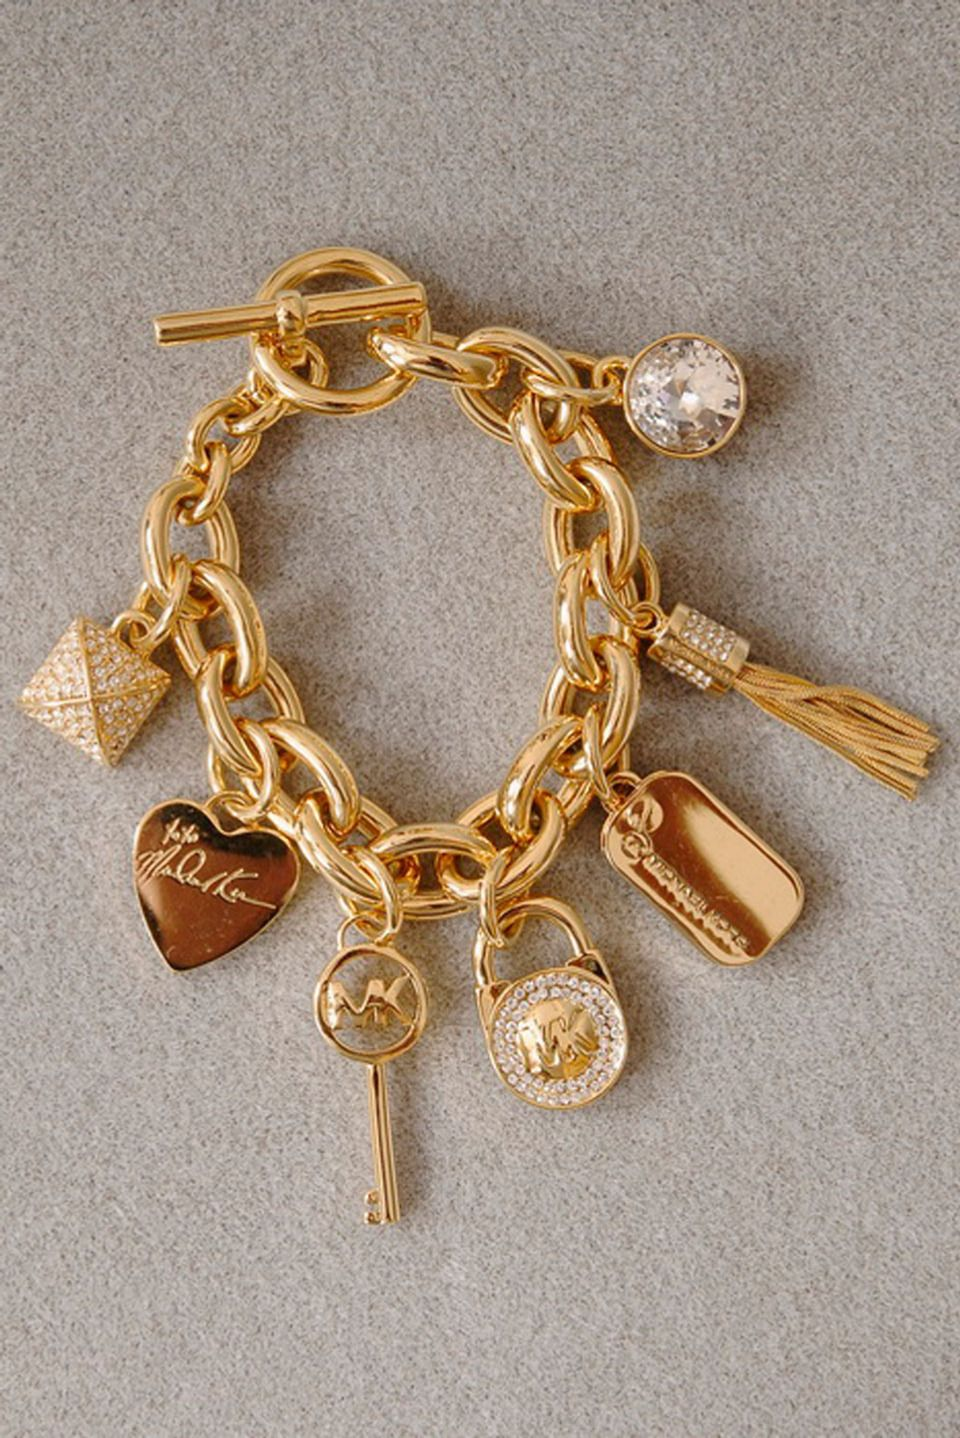 Michael Kors Pave Rhinestone Charm Bracelet In Gold  Beyond The Rack